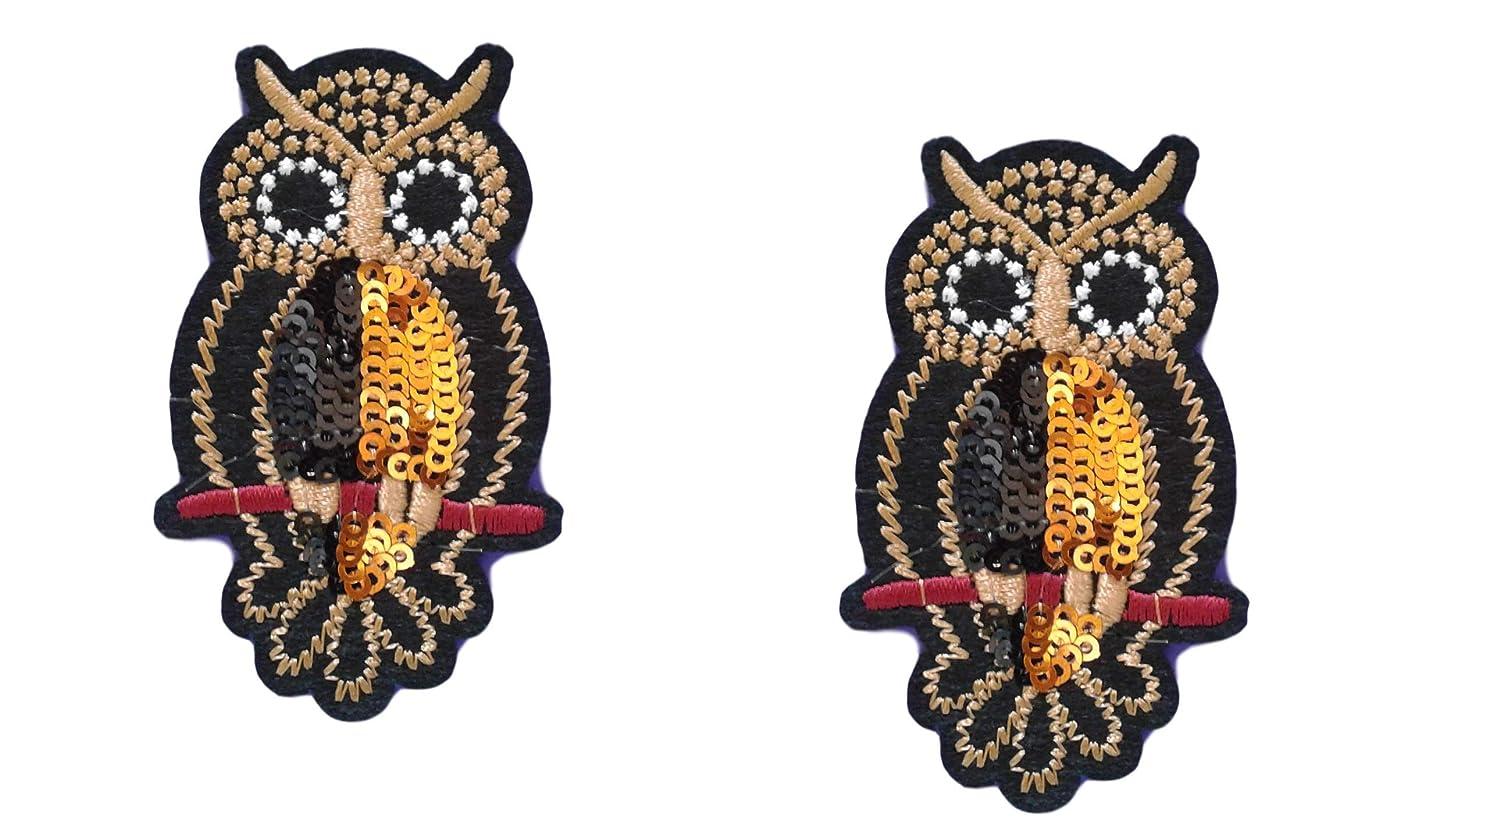 2 Pieces OWL Iron On Patch Fabric Applique Bird Animal Motif Cartoon Decal 2.75 x 1.65 inches (7 x 4.2 cm)